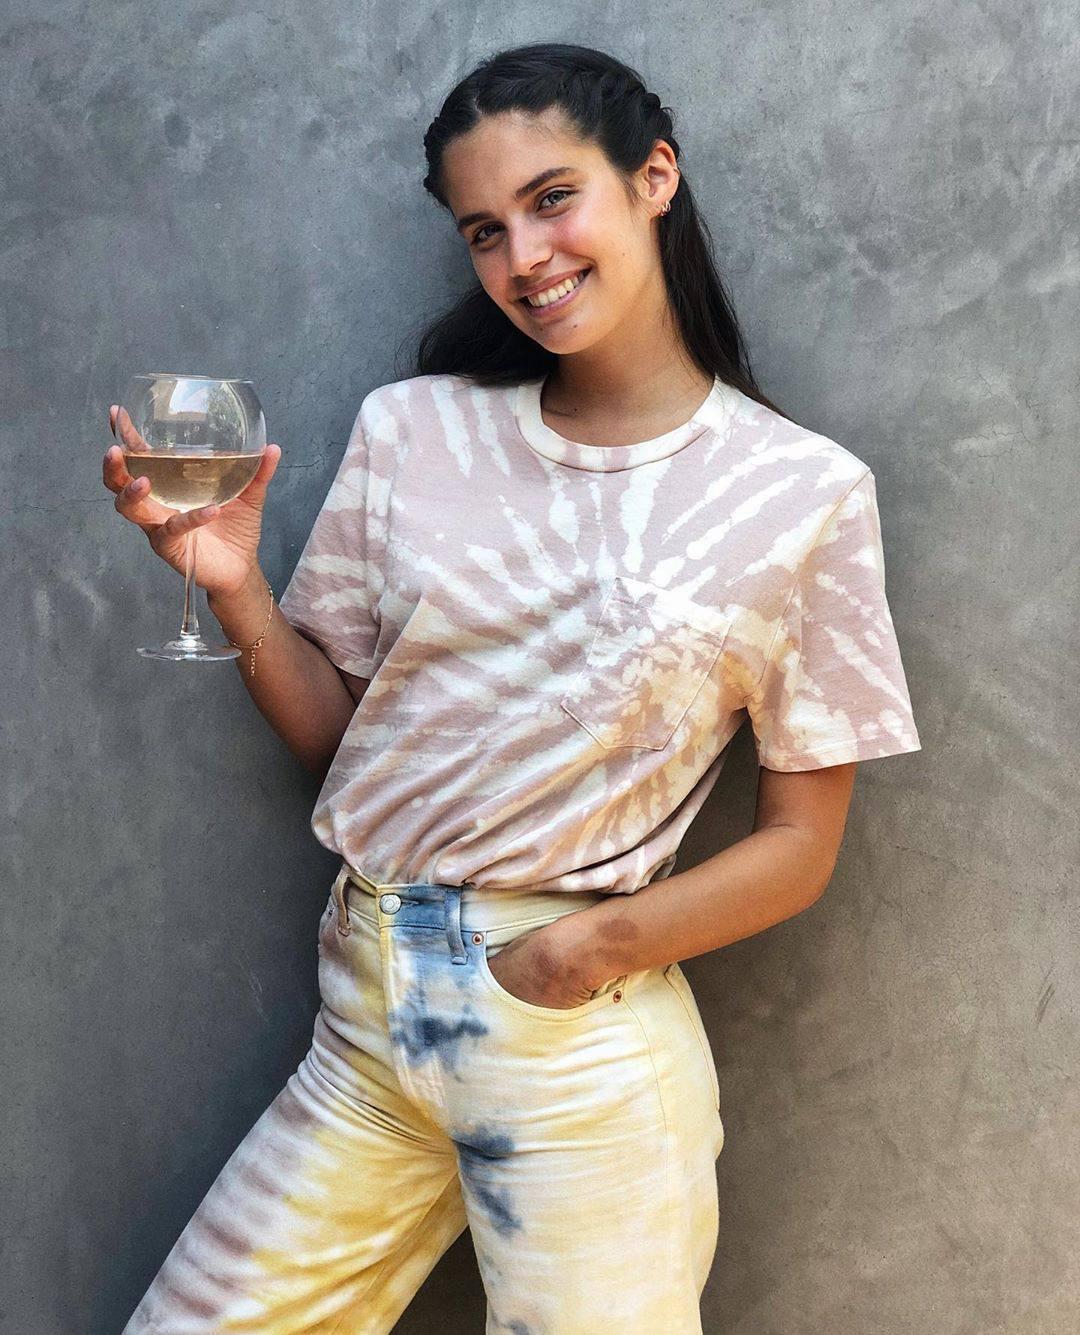 Sara Sampaio Pretty With Glass Of Wine